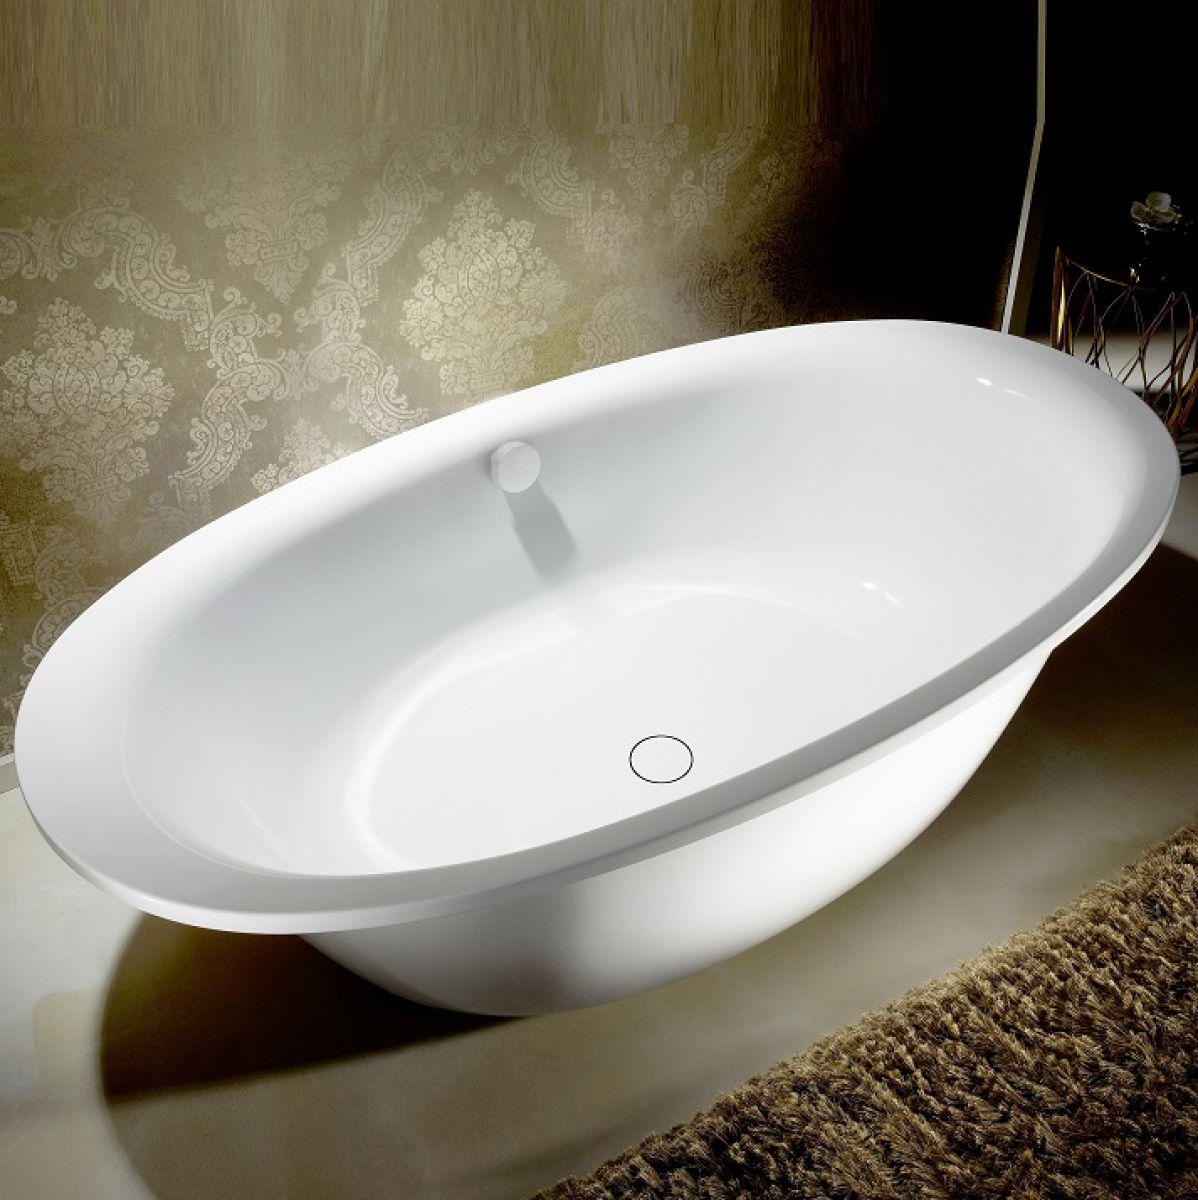 kaldewei ellipso duo oval freestanding steel bath uk. Black Bedroom Furniture Sets. Home Design Ideas